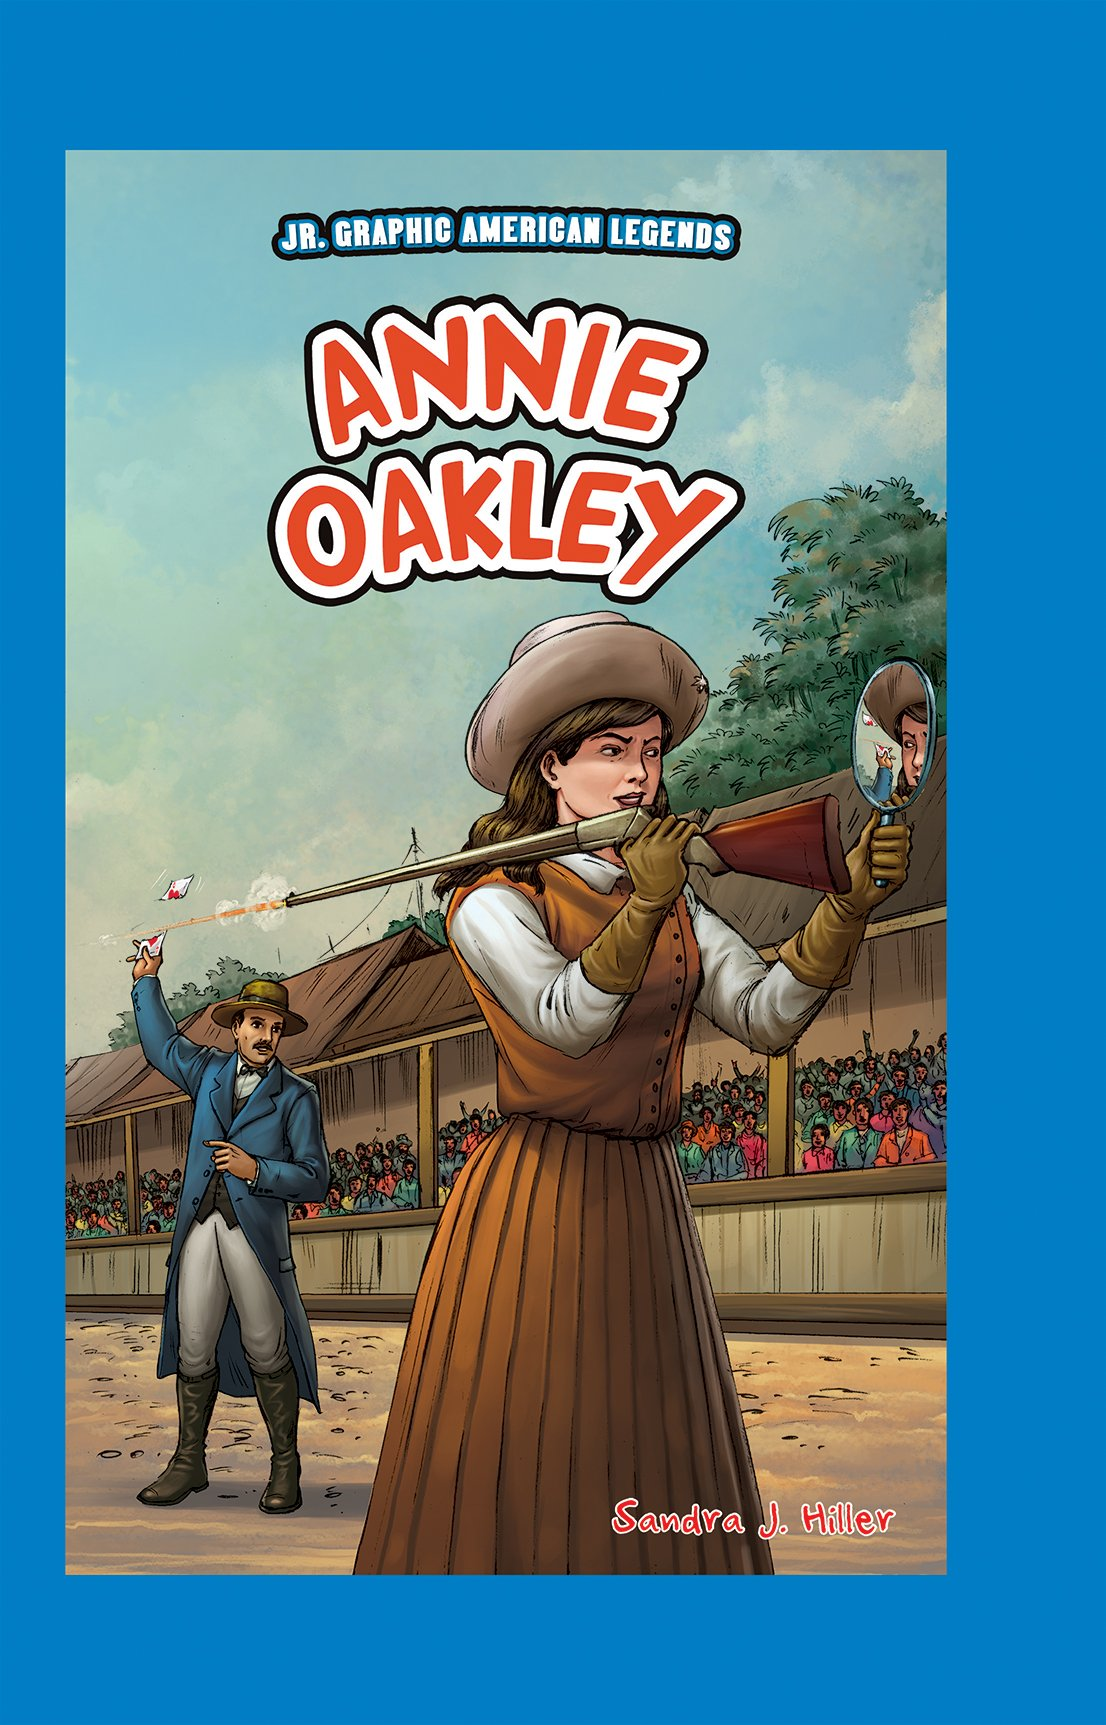 Annie Oakley (JR. Graphic American Legends)